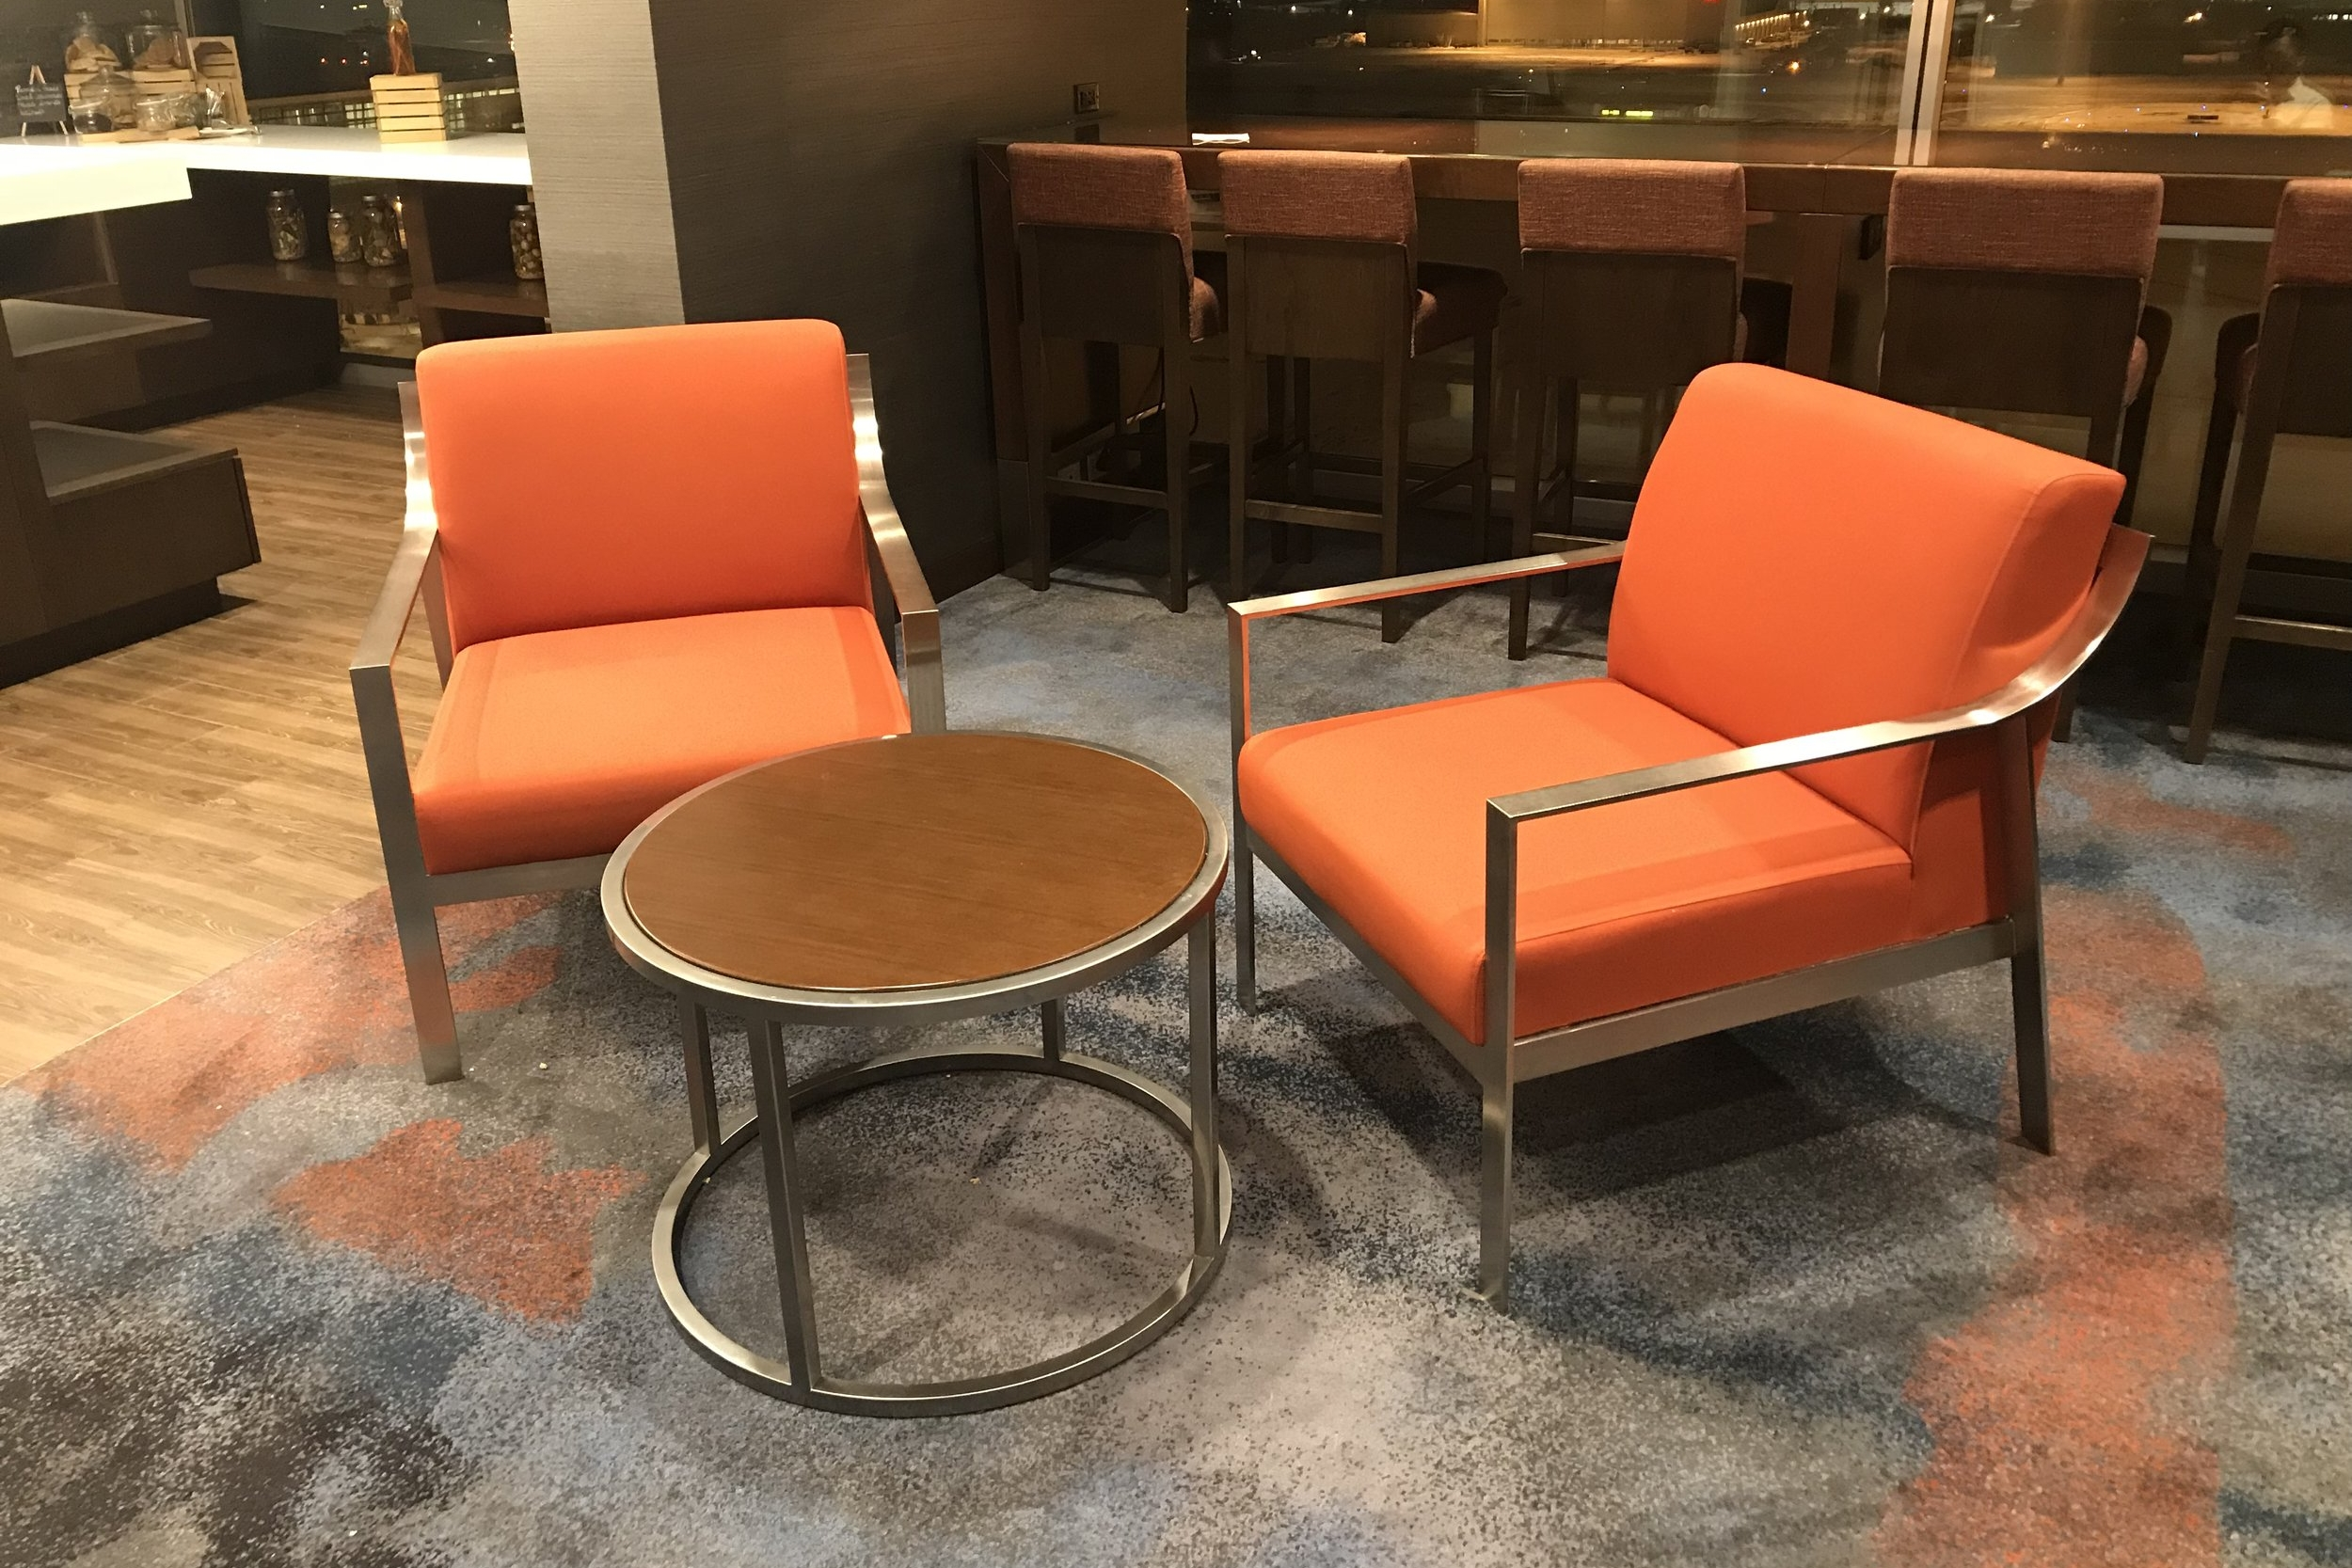 Marriott In-Terminal Hotel Calgary Airport – M Club seating area